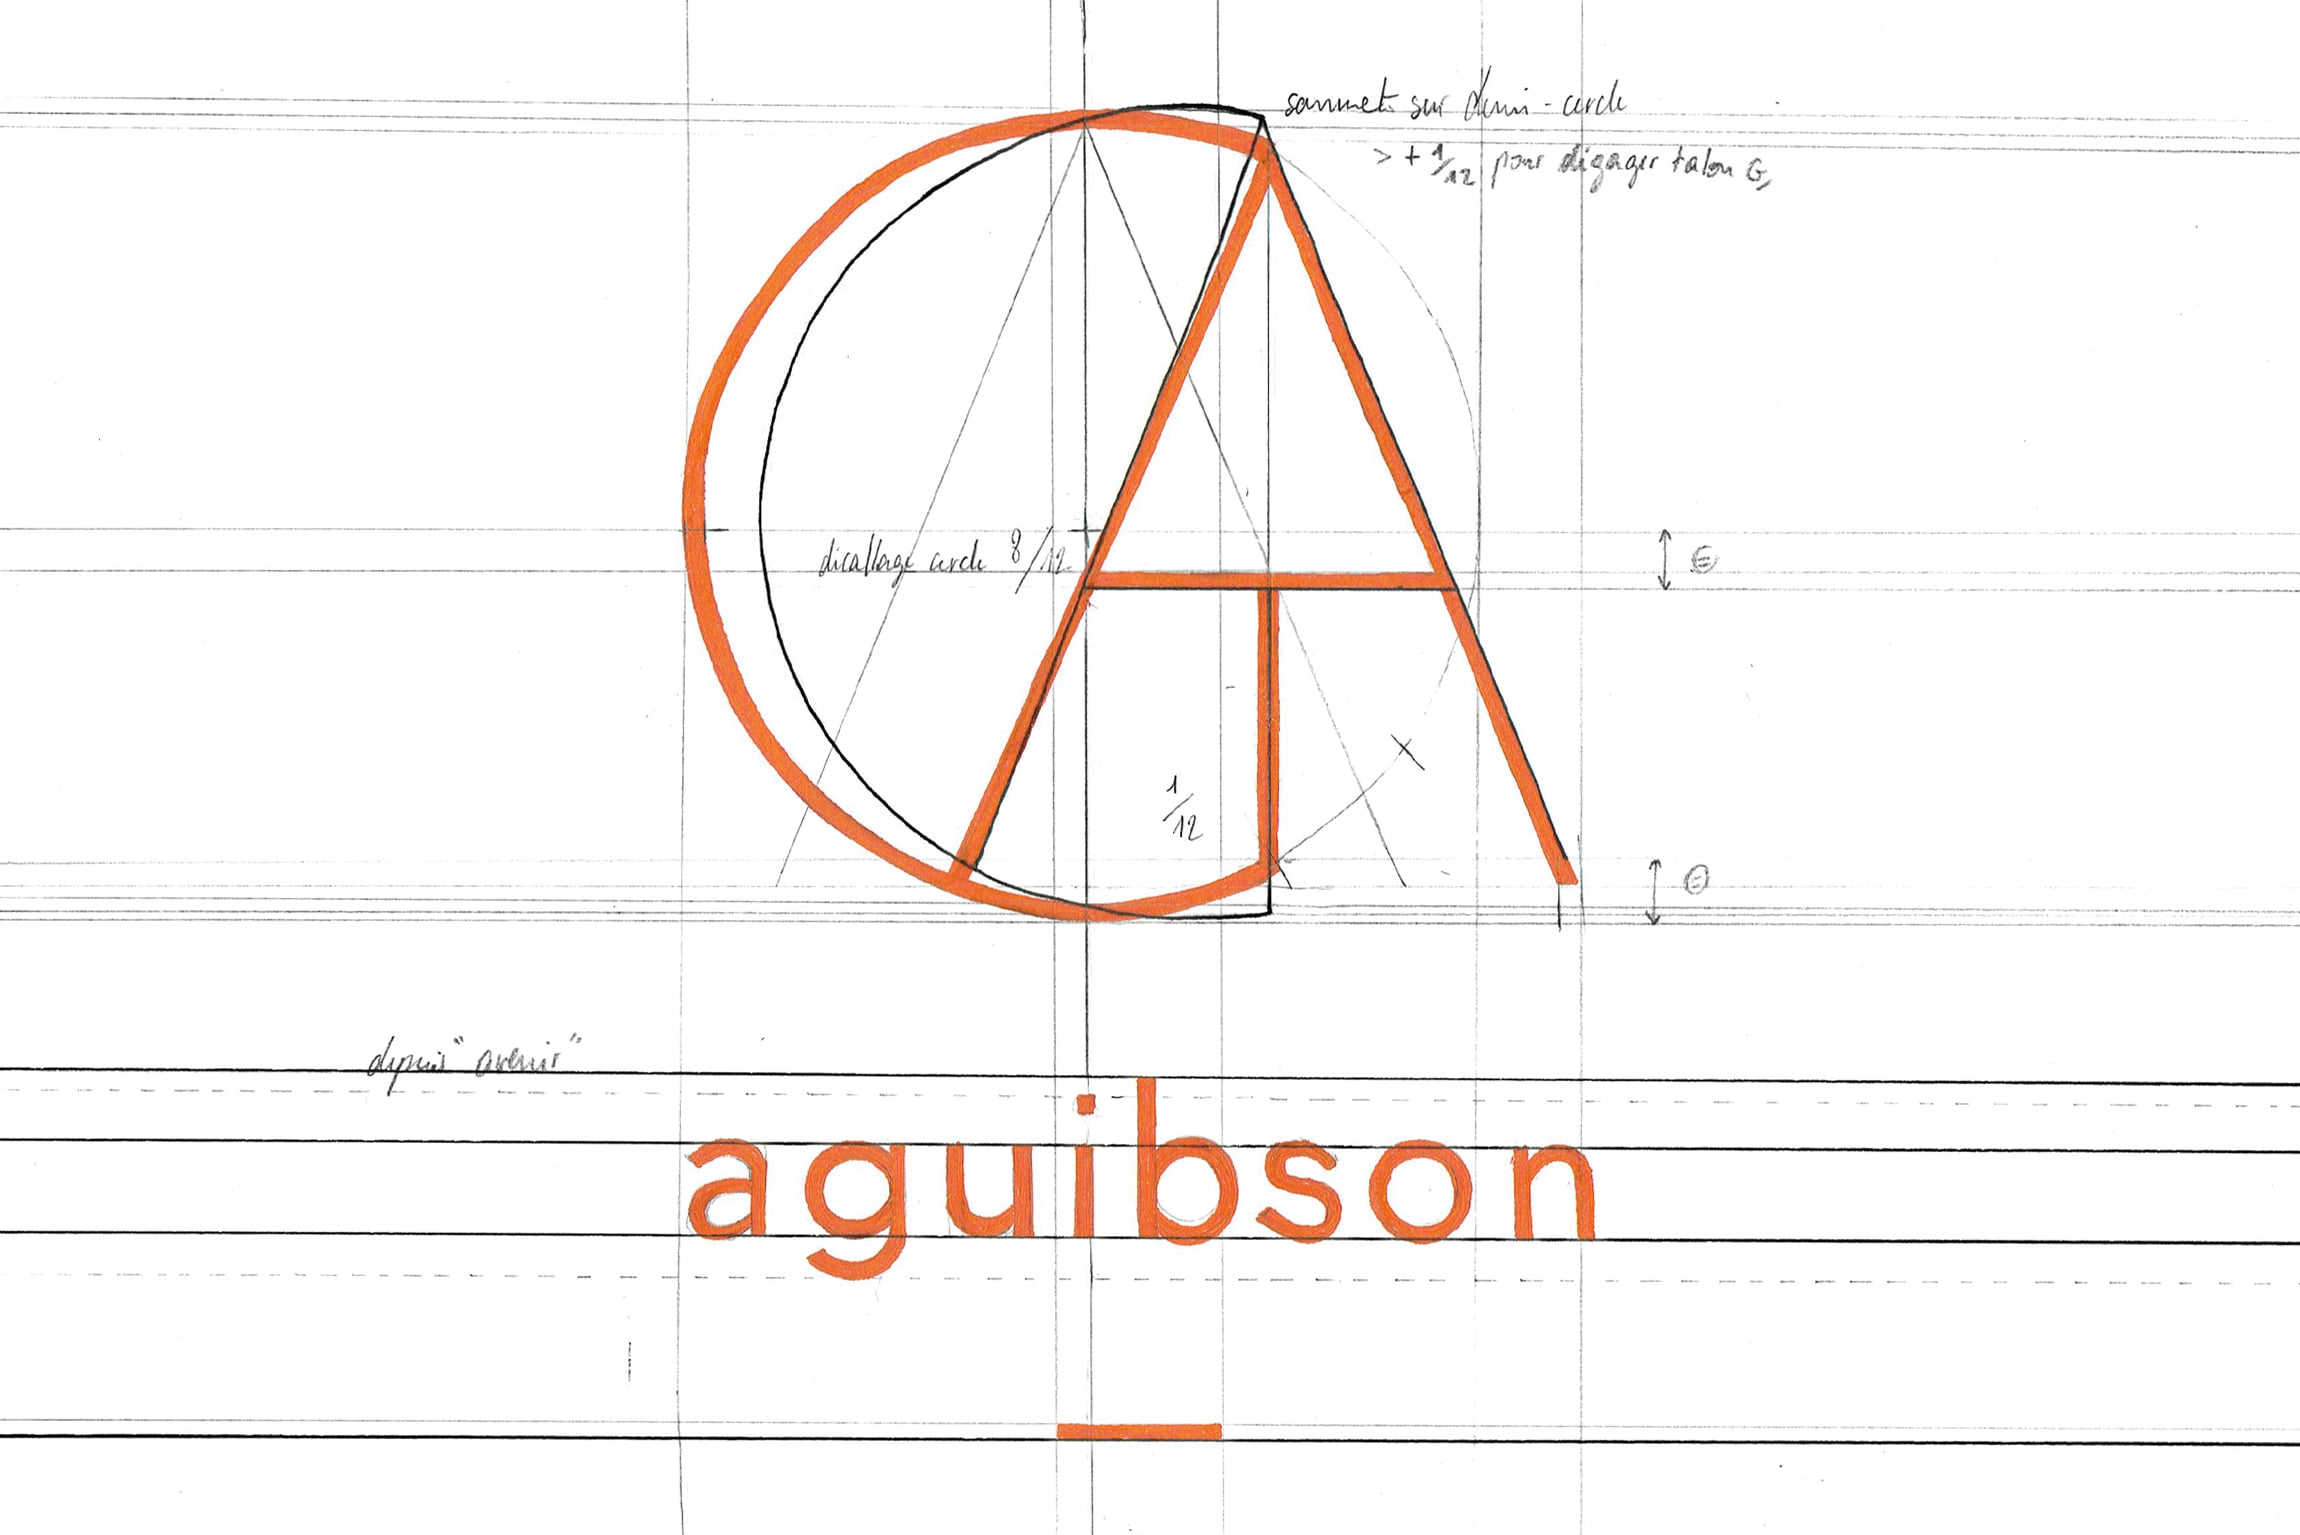 logotypeOK 17.28.46.jpg